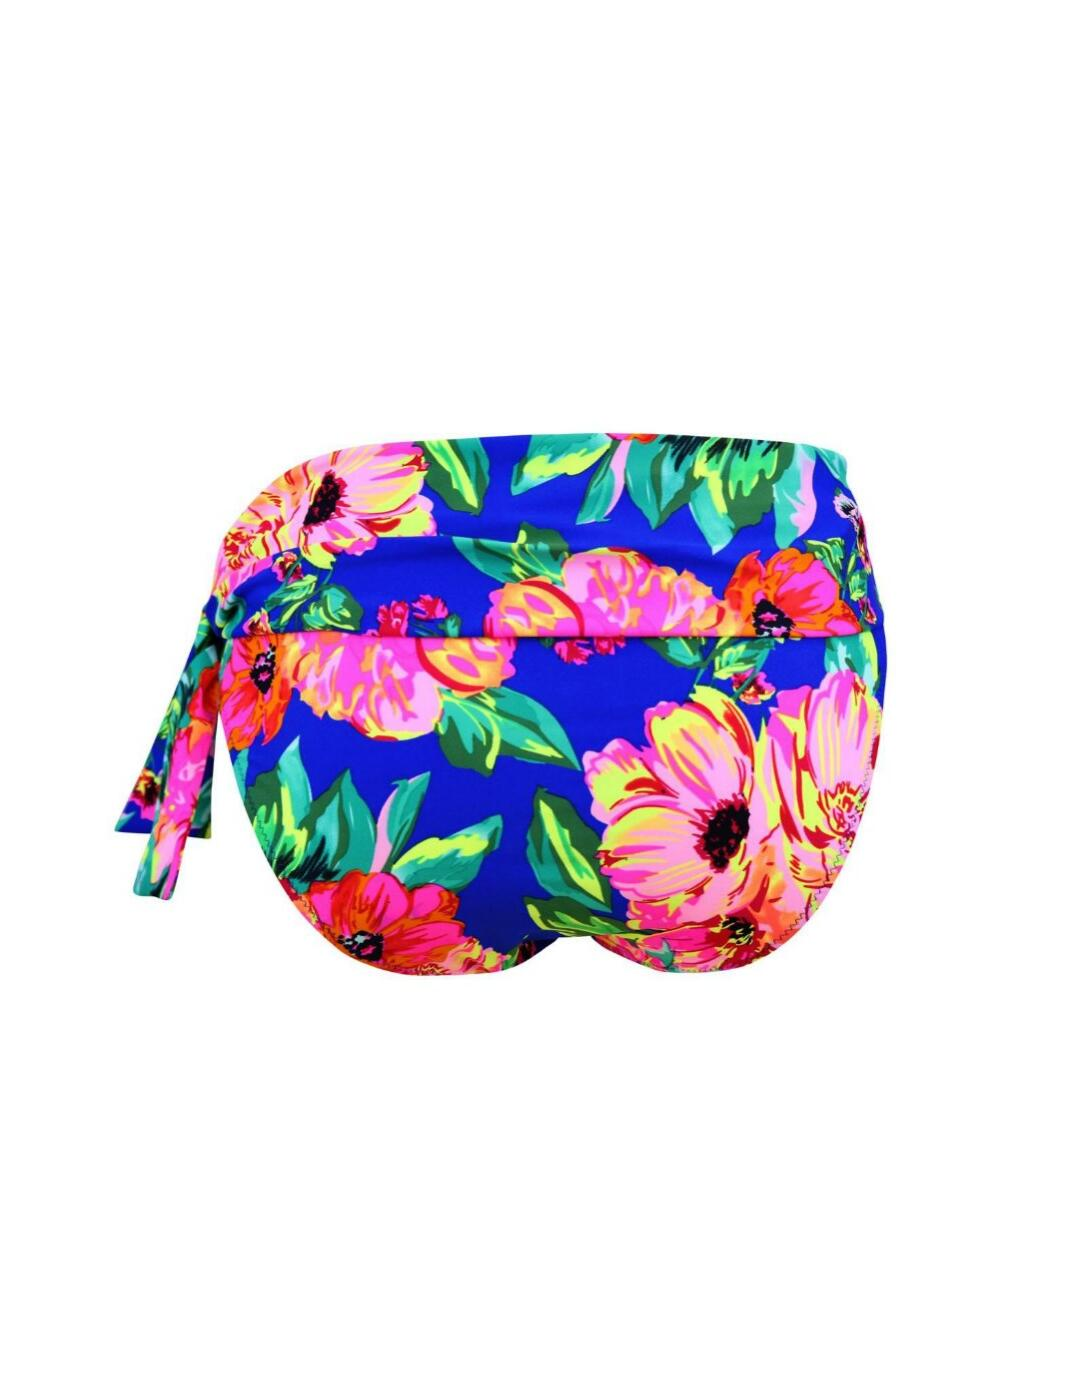 Pour-Moi-Heatwave-Fold-Over-Bikini-Brief-Bottoms-86003-New-Womens-Swimwear thumbnail 7